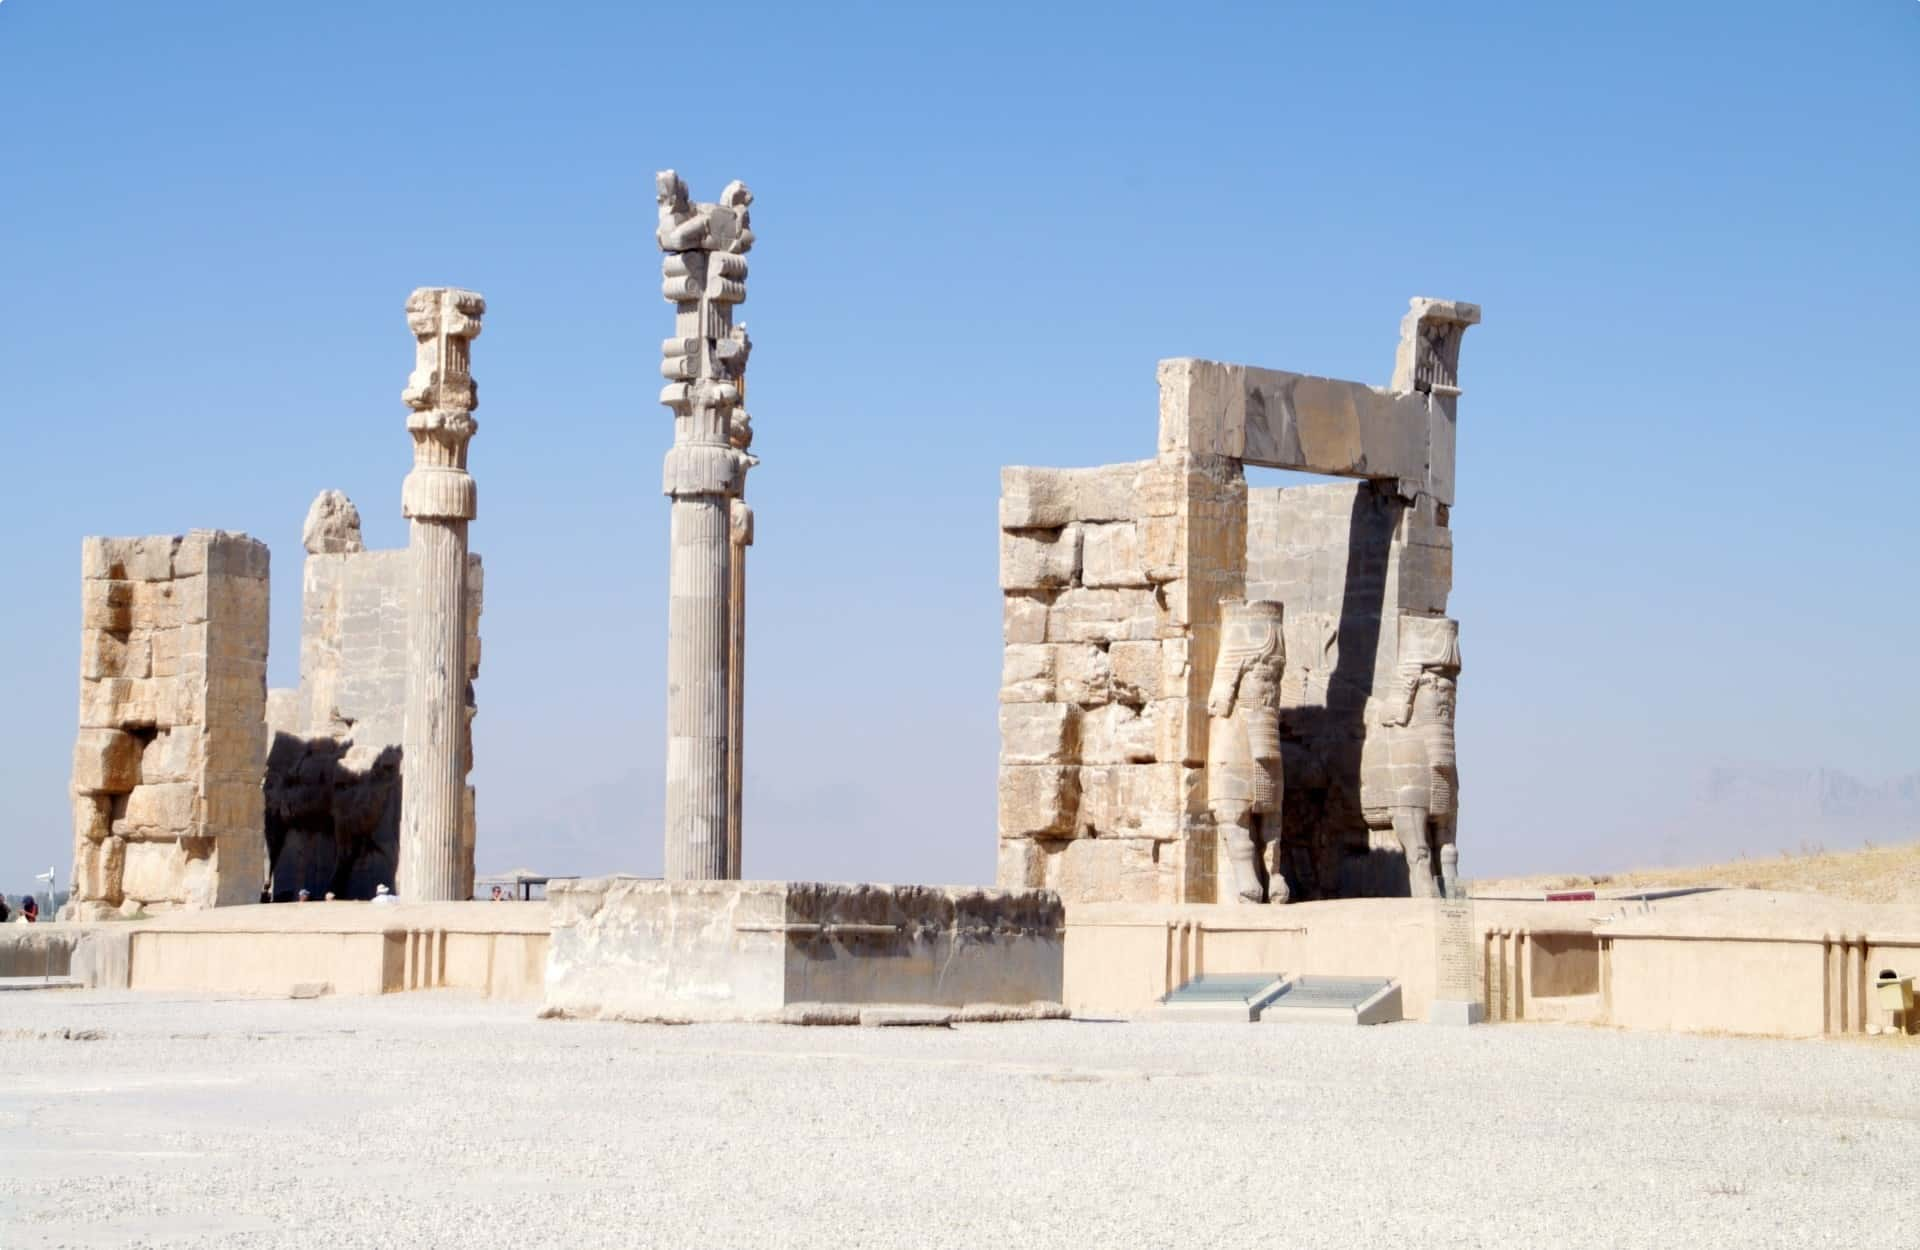 Touring Persepolis in Iran